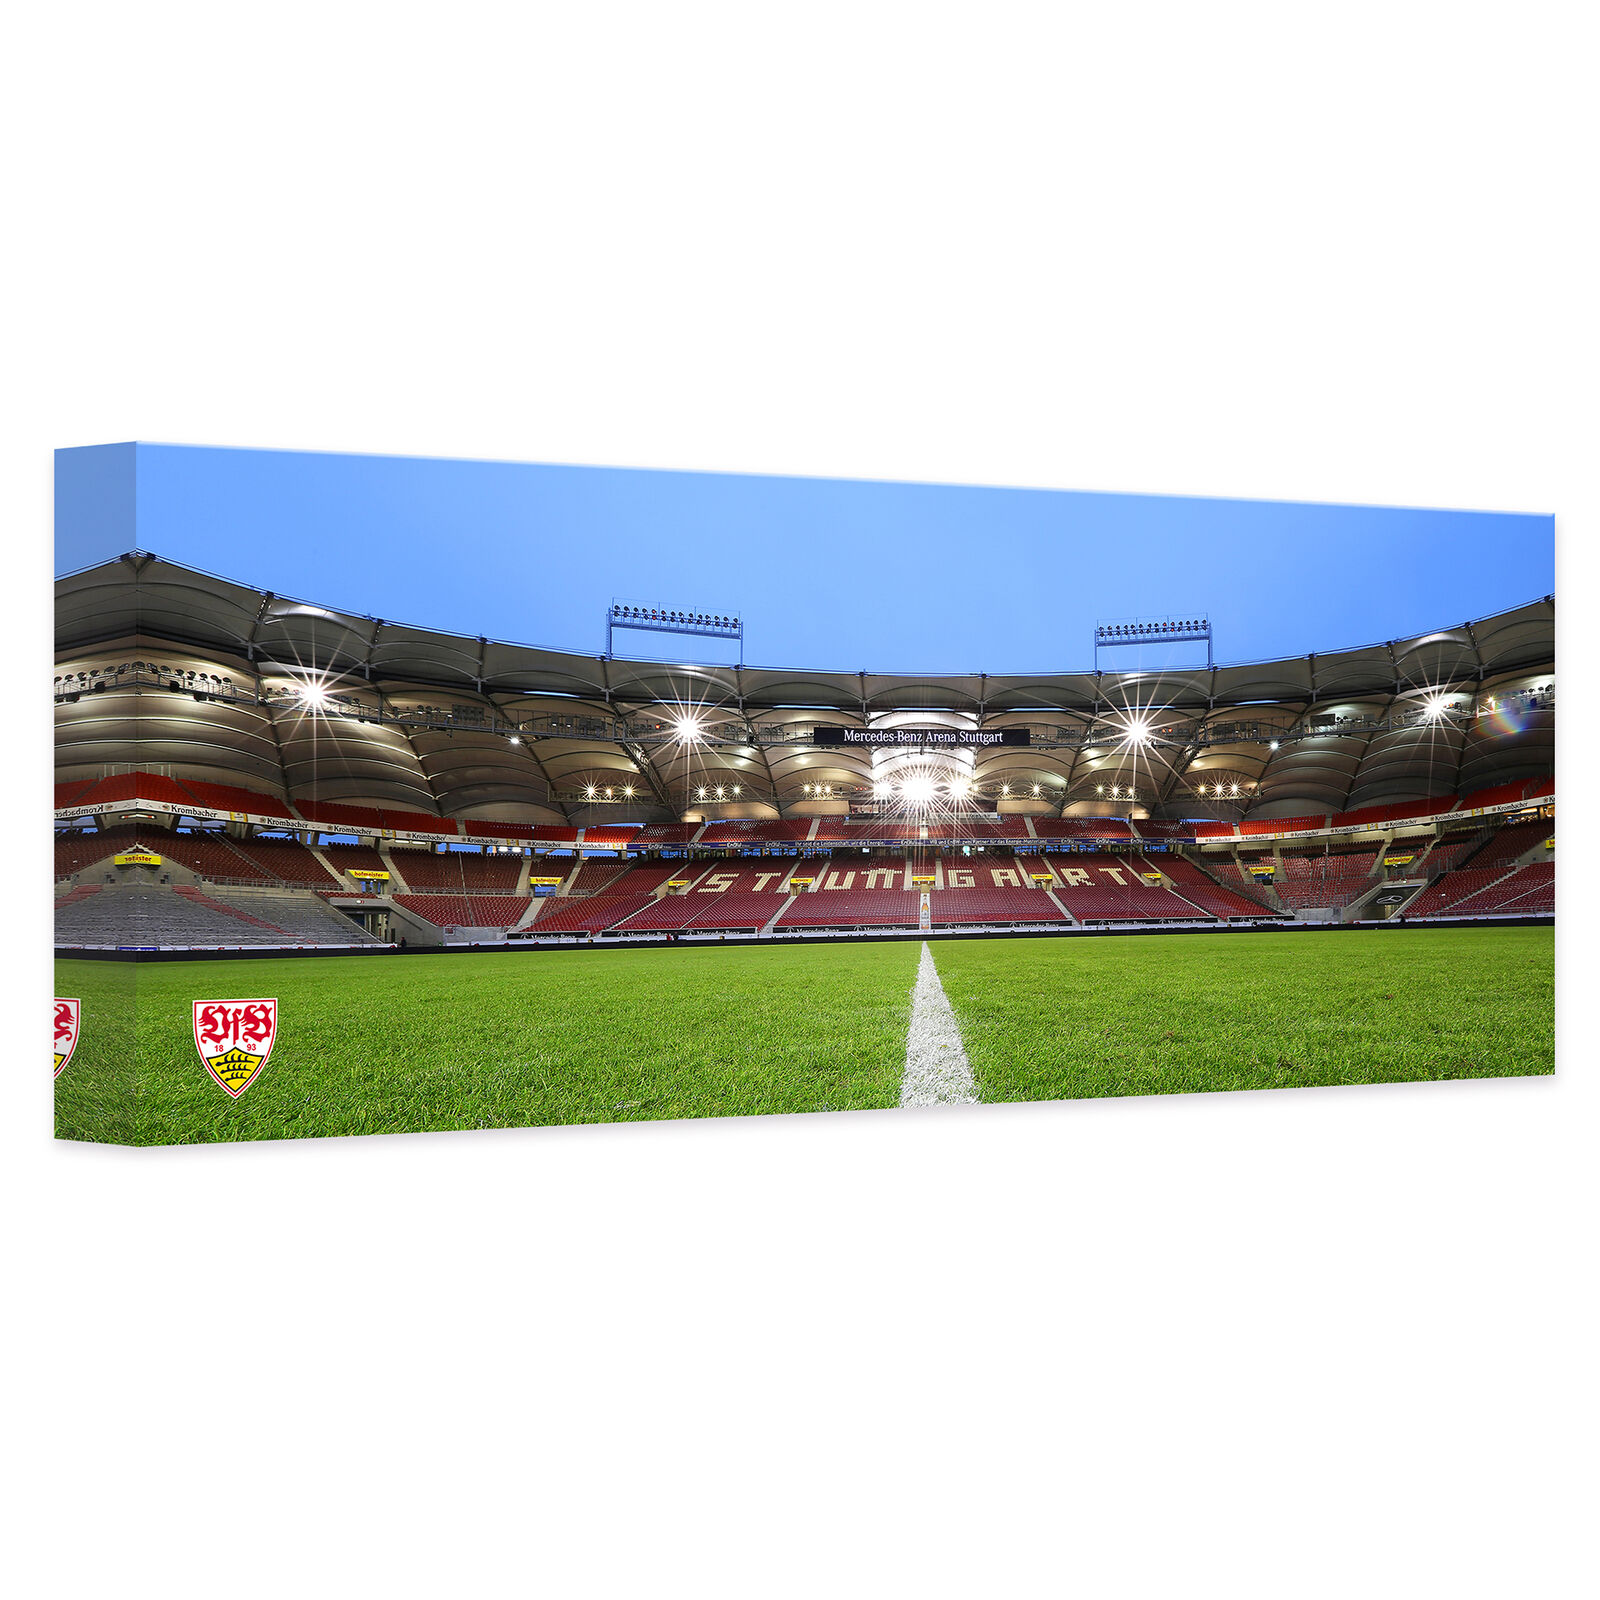 Leinwand Leinwandbild VfB Stuttgart Arena Tribüne - Panorama bunt